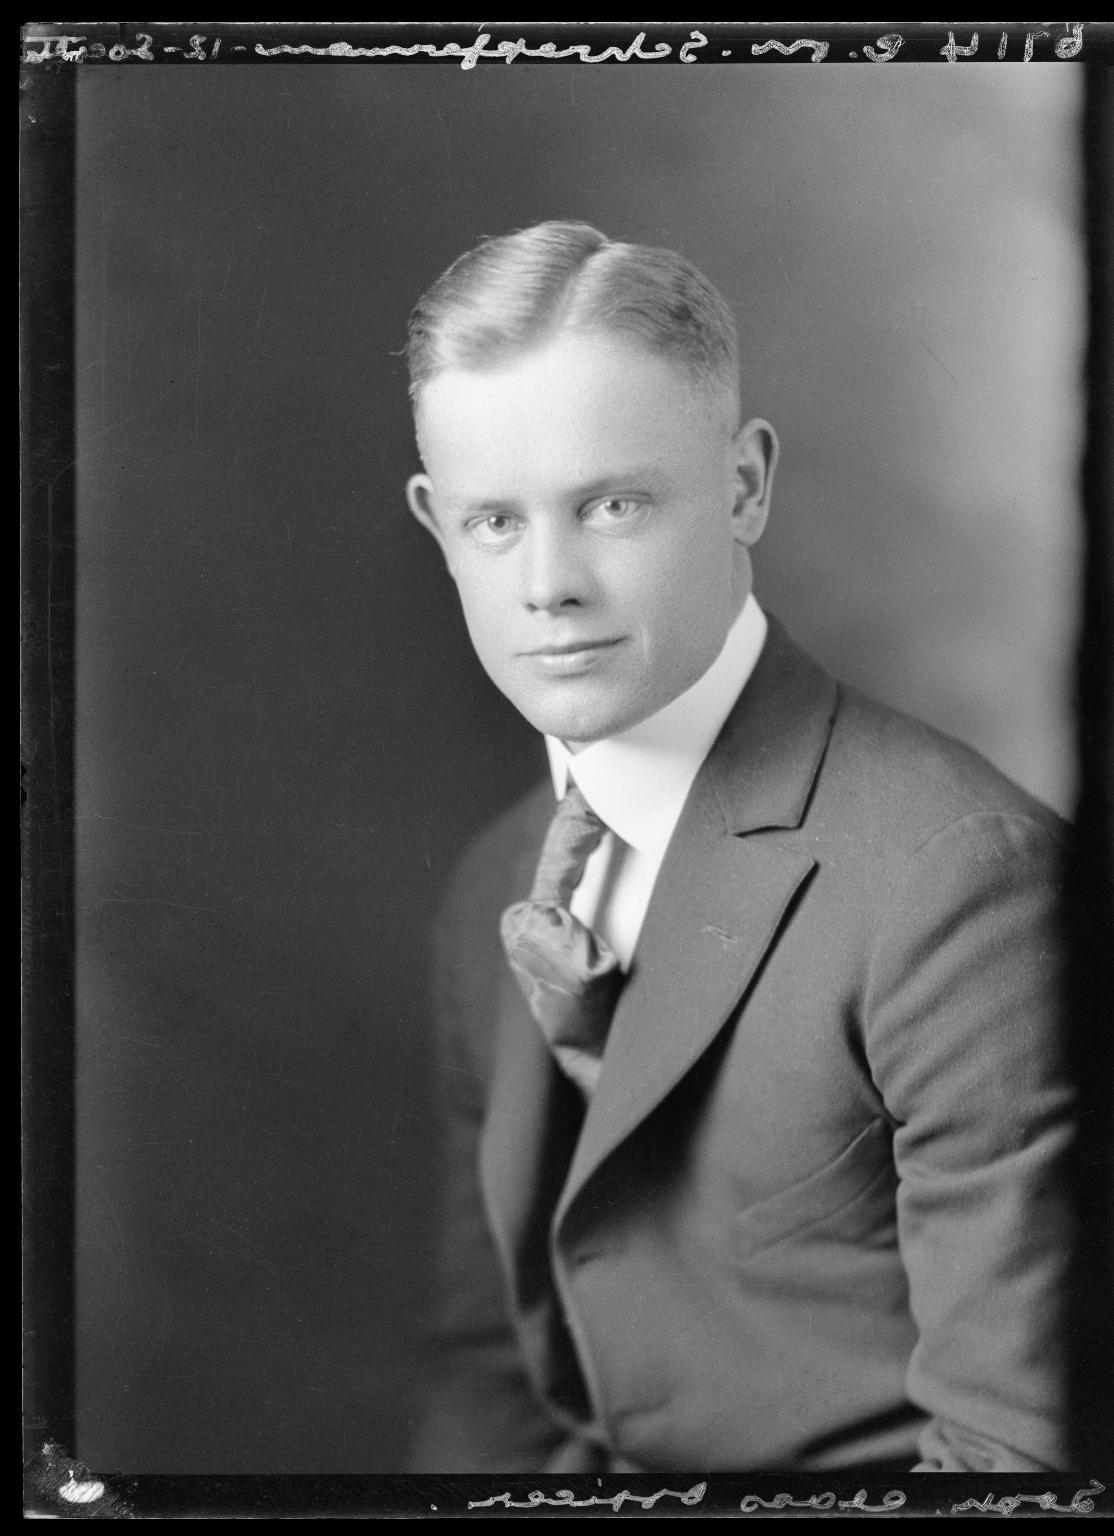 Portrait of C. M. Schrepperman